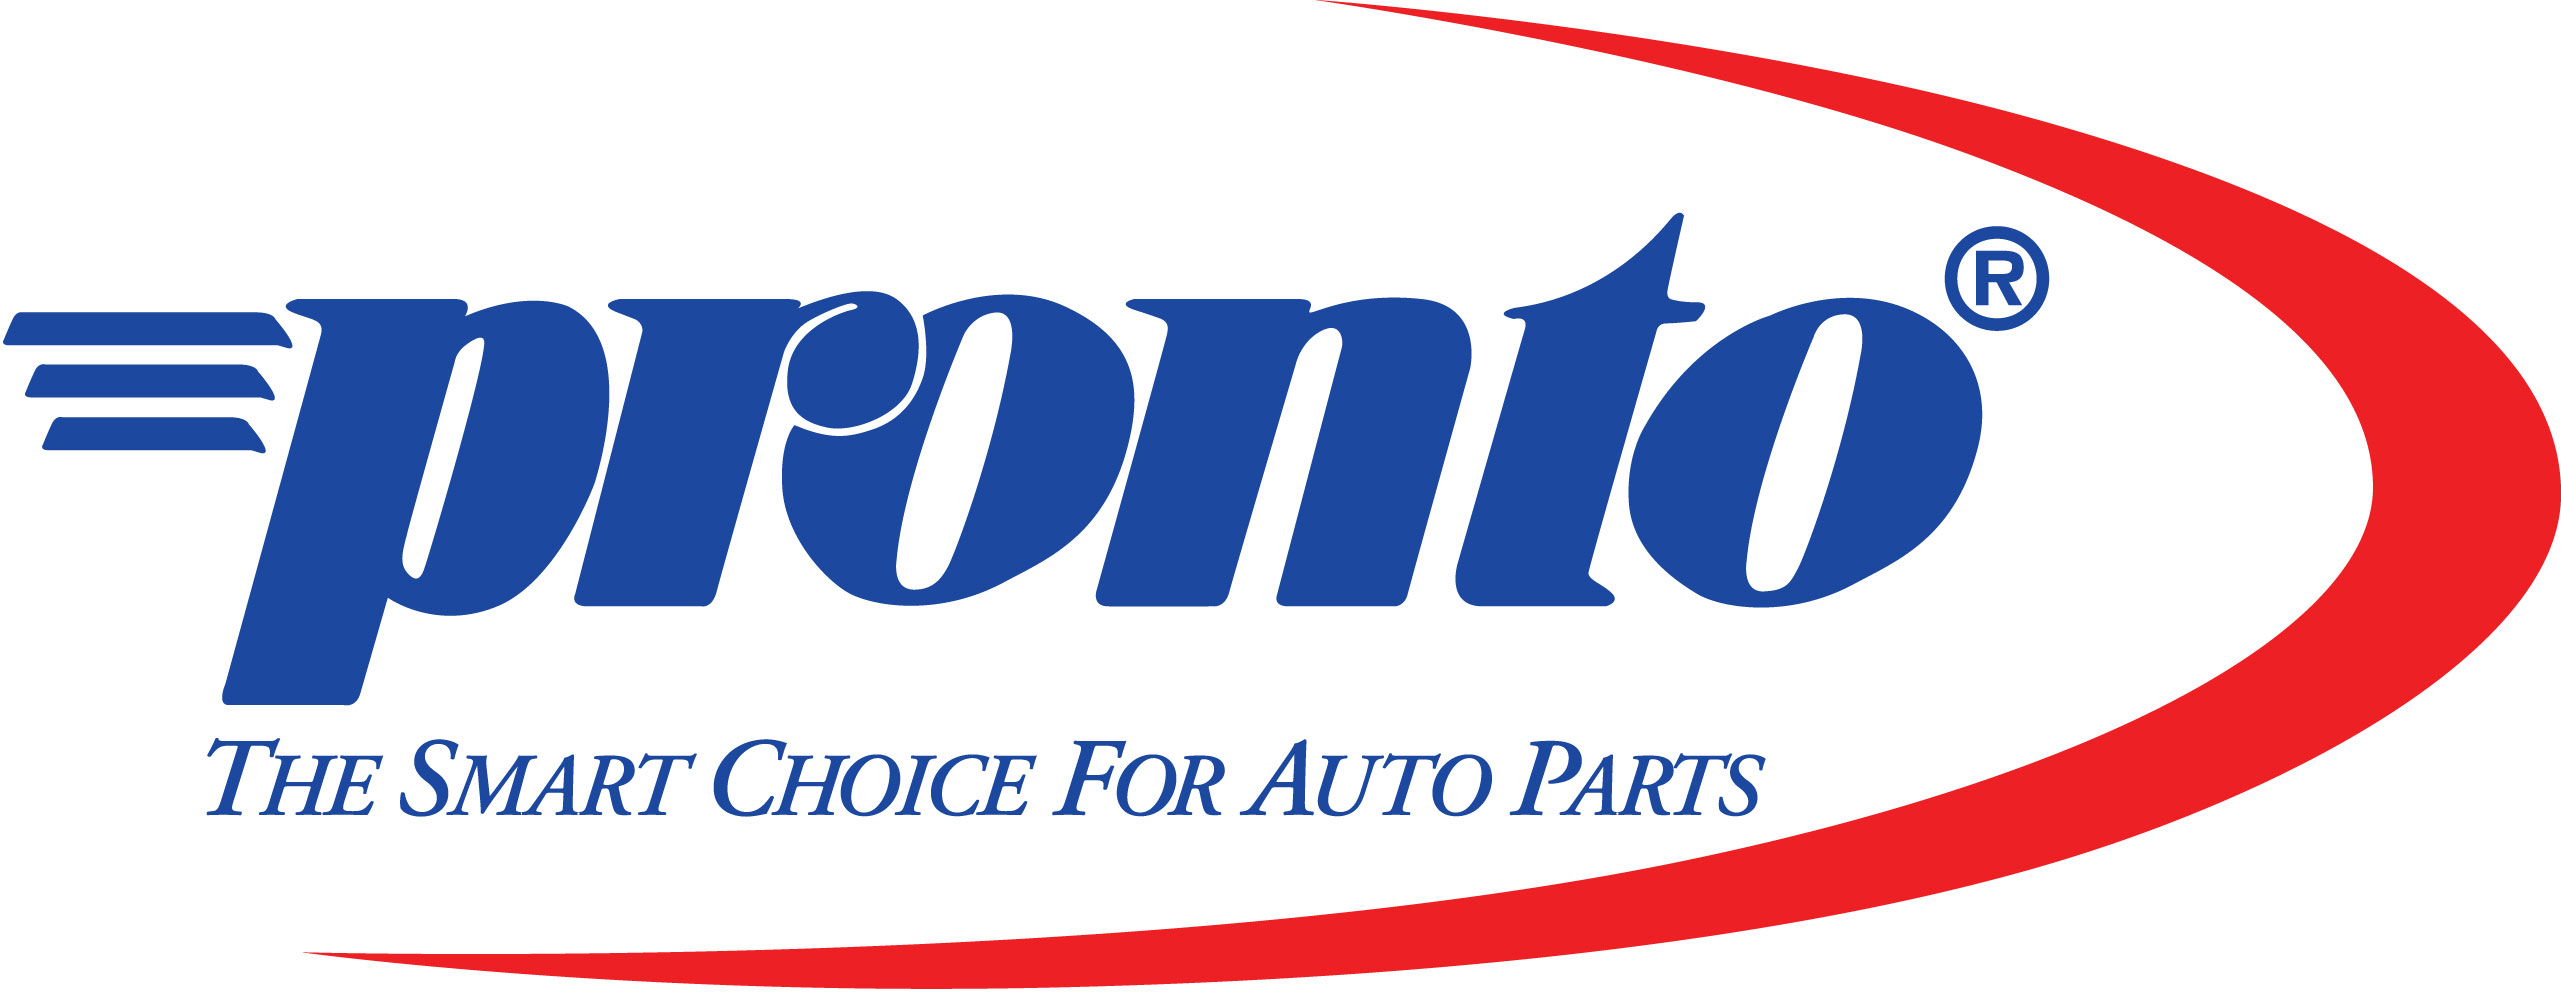 Pronto Auto Parts >> Pronto Adds Professional Parts Inc To Its Membership